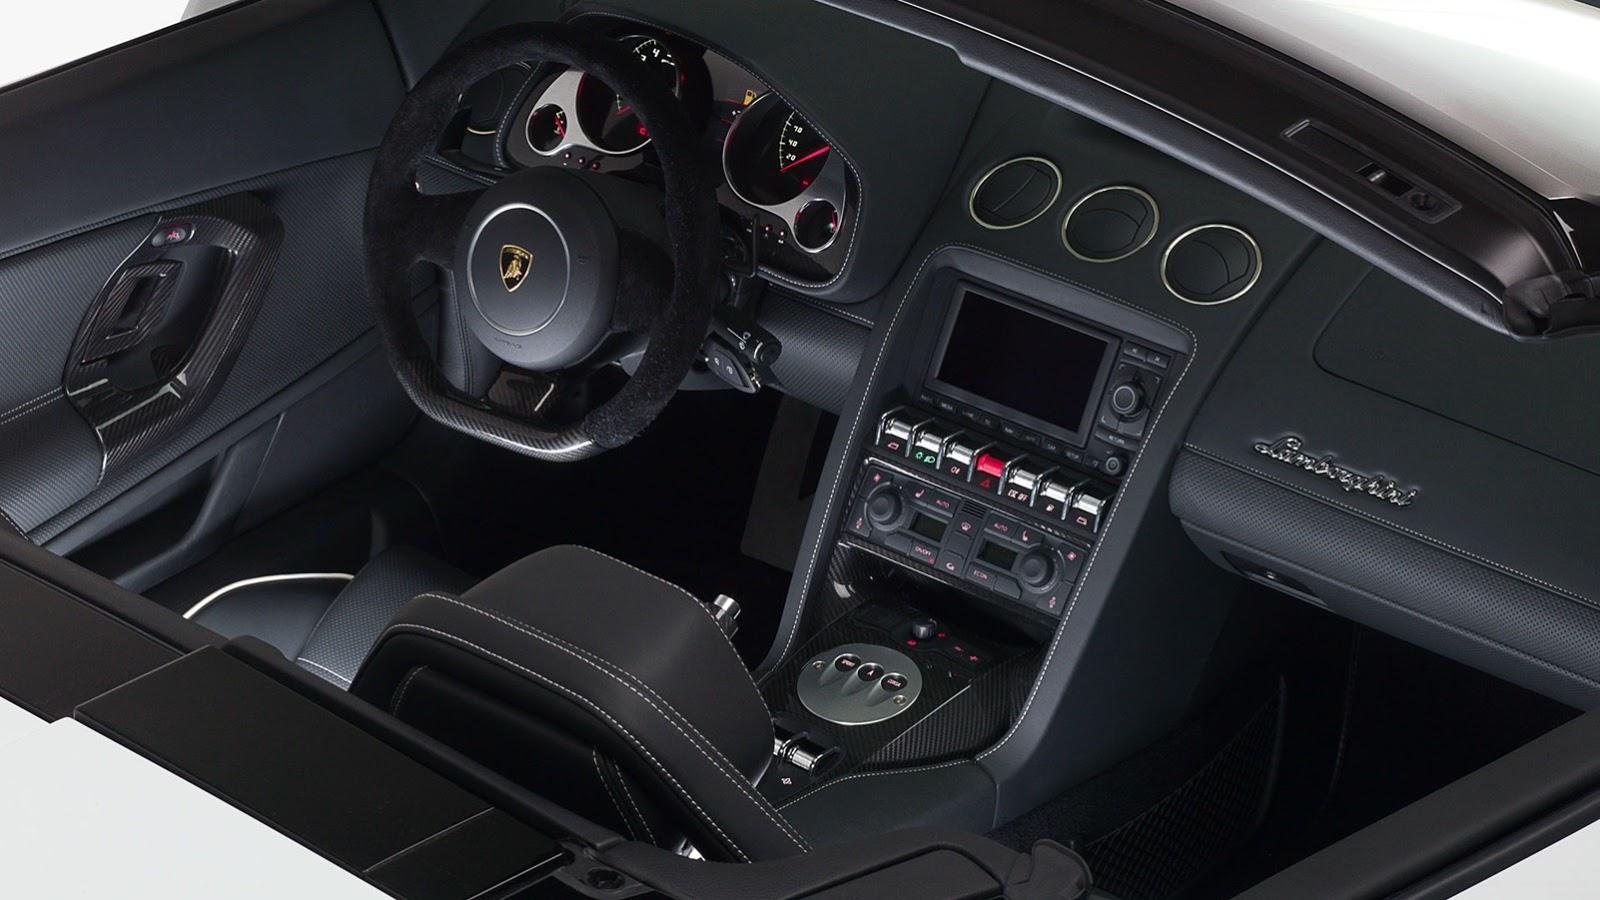 Lamborghini_Gallardo_Spyder_Facelift_Interior